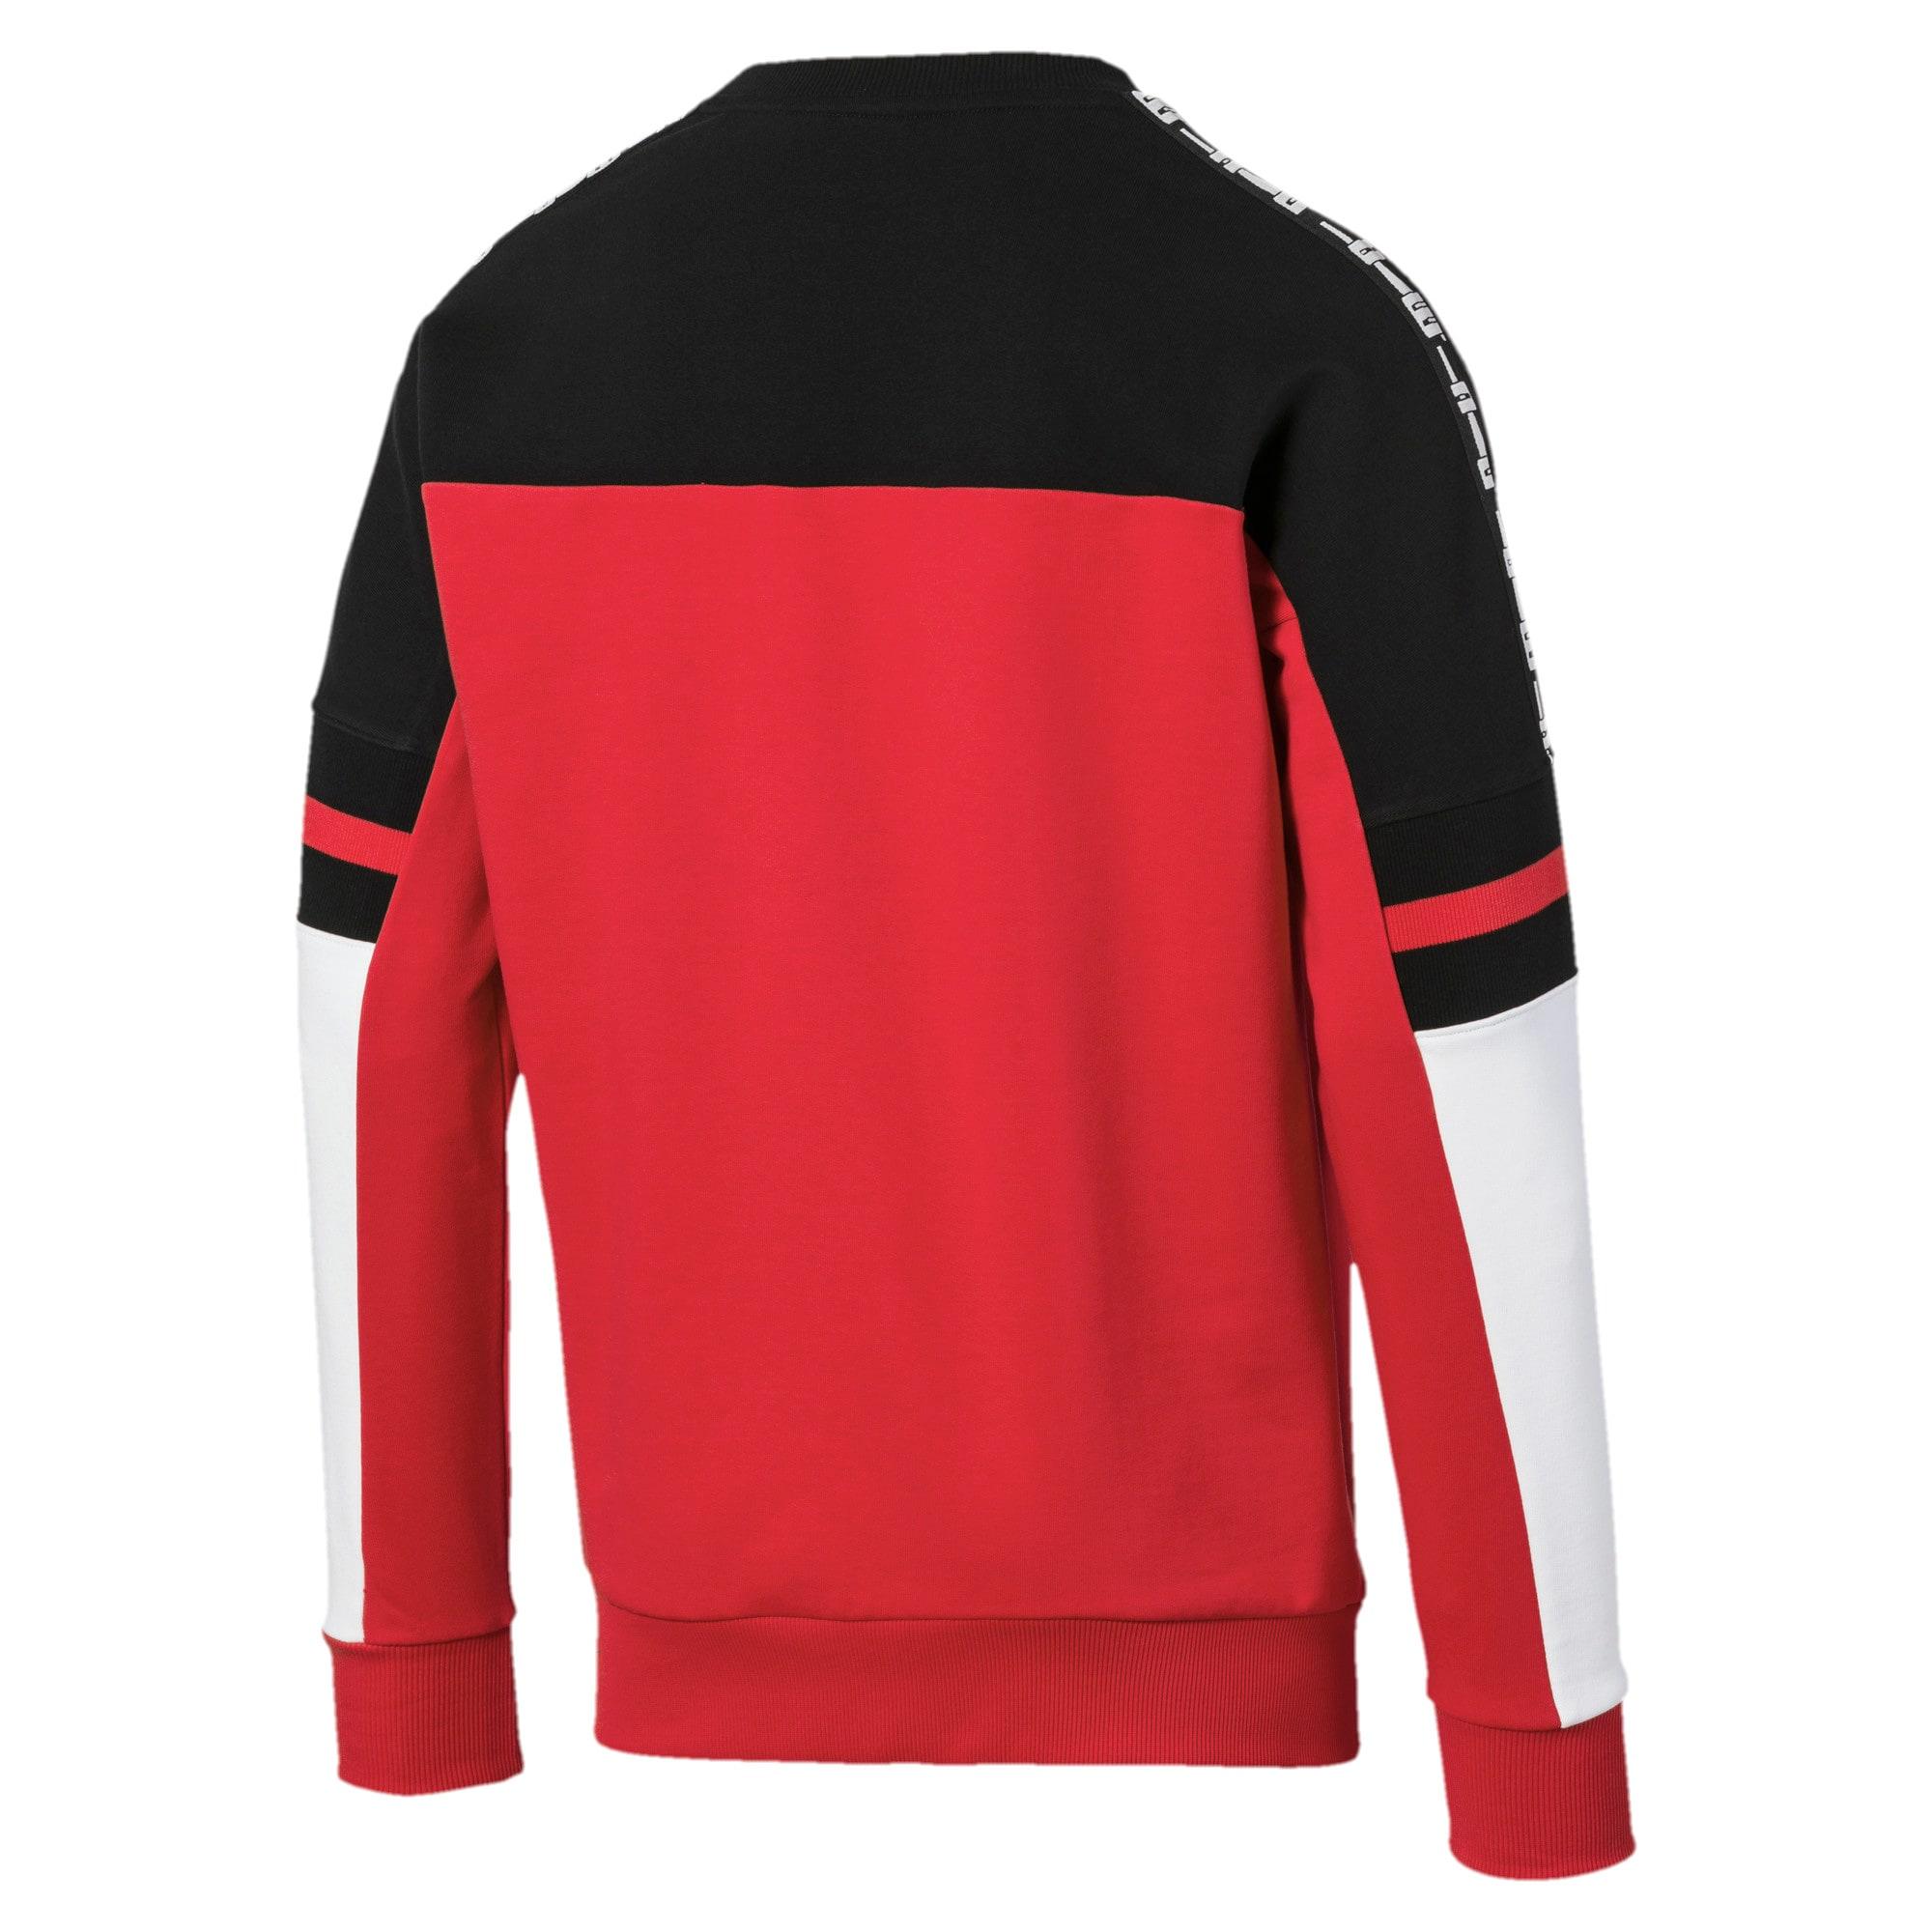 Thumbnail 5 of PUMA XTG Men's Crewneck Sweatshirt, High Risk Red, medium